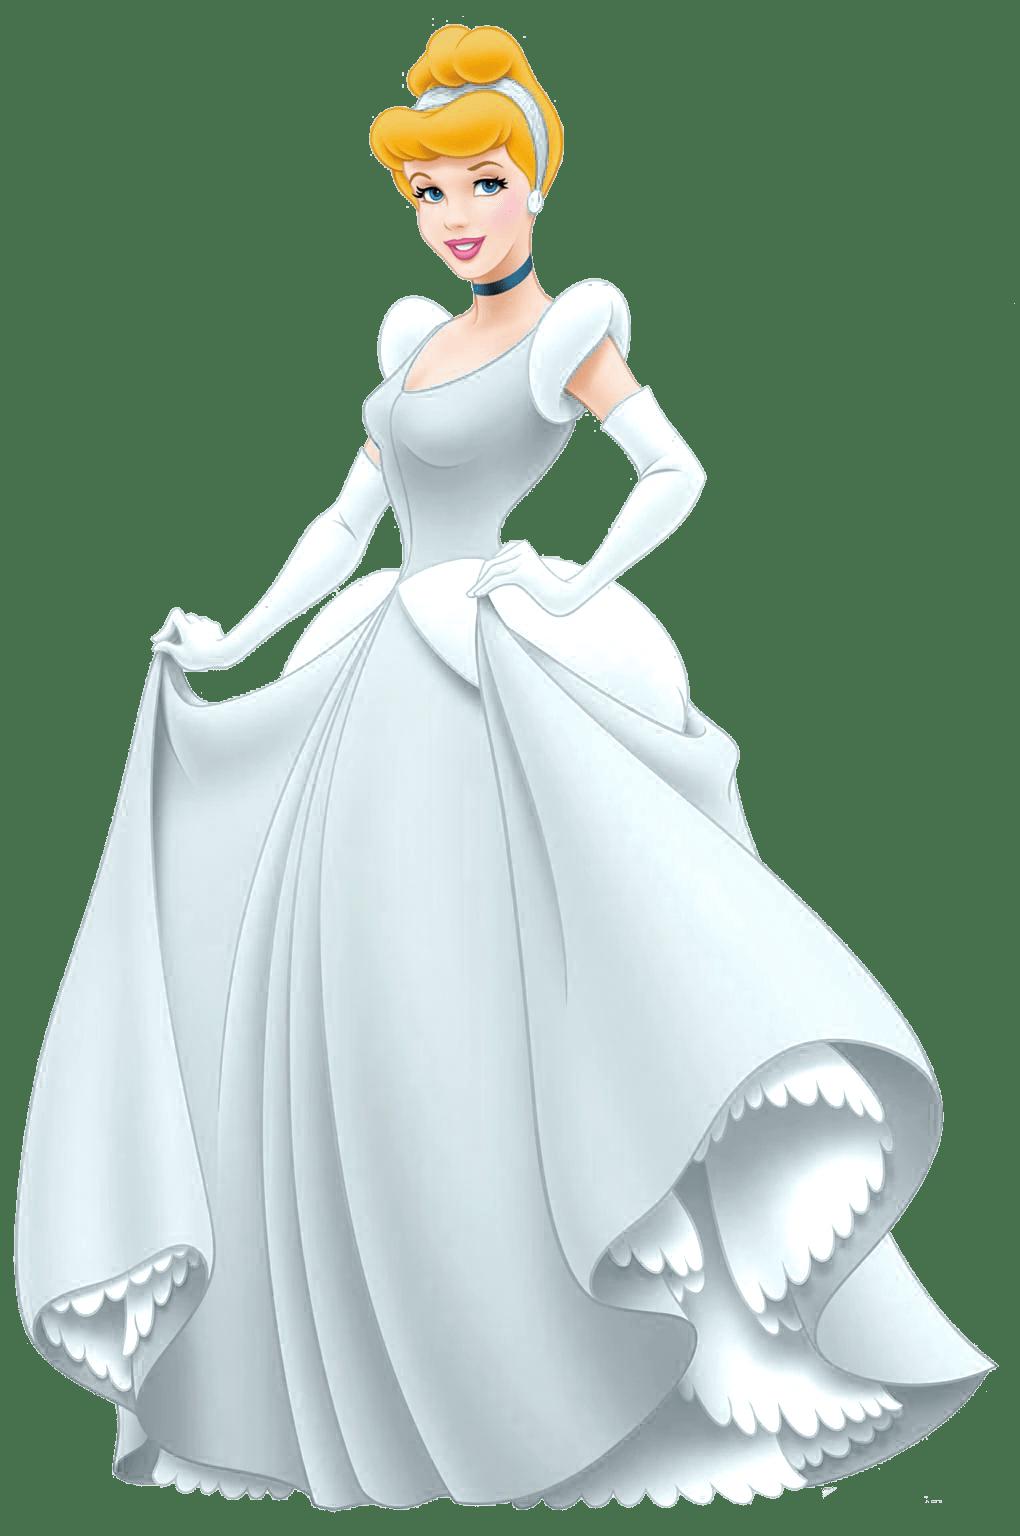 Cinderella Story Skeleton